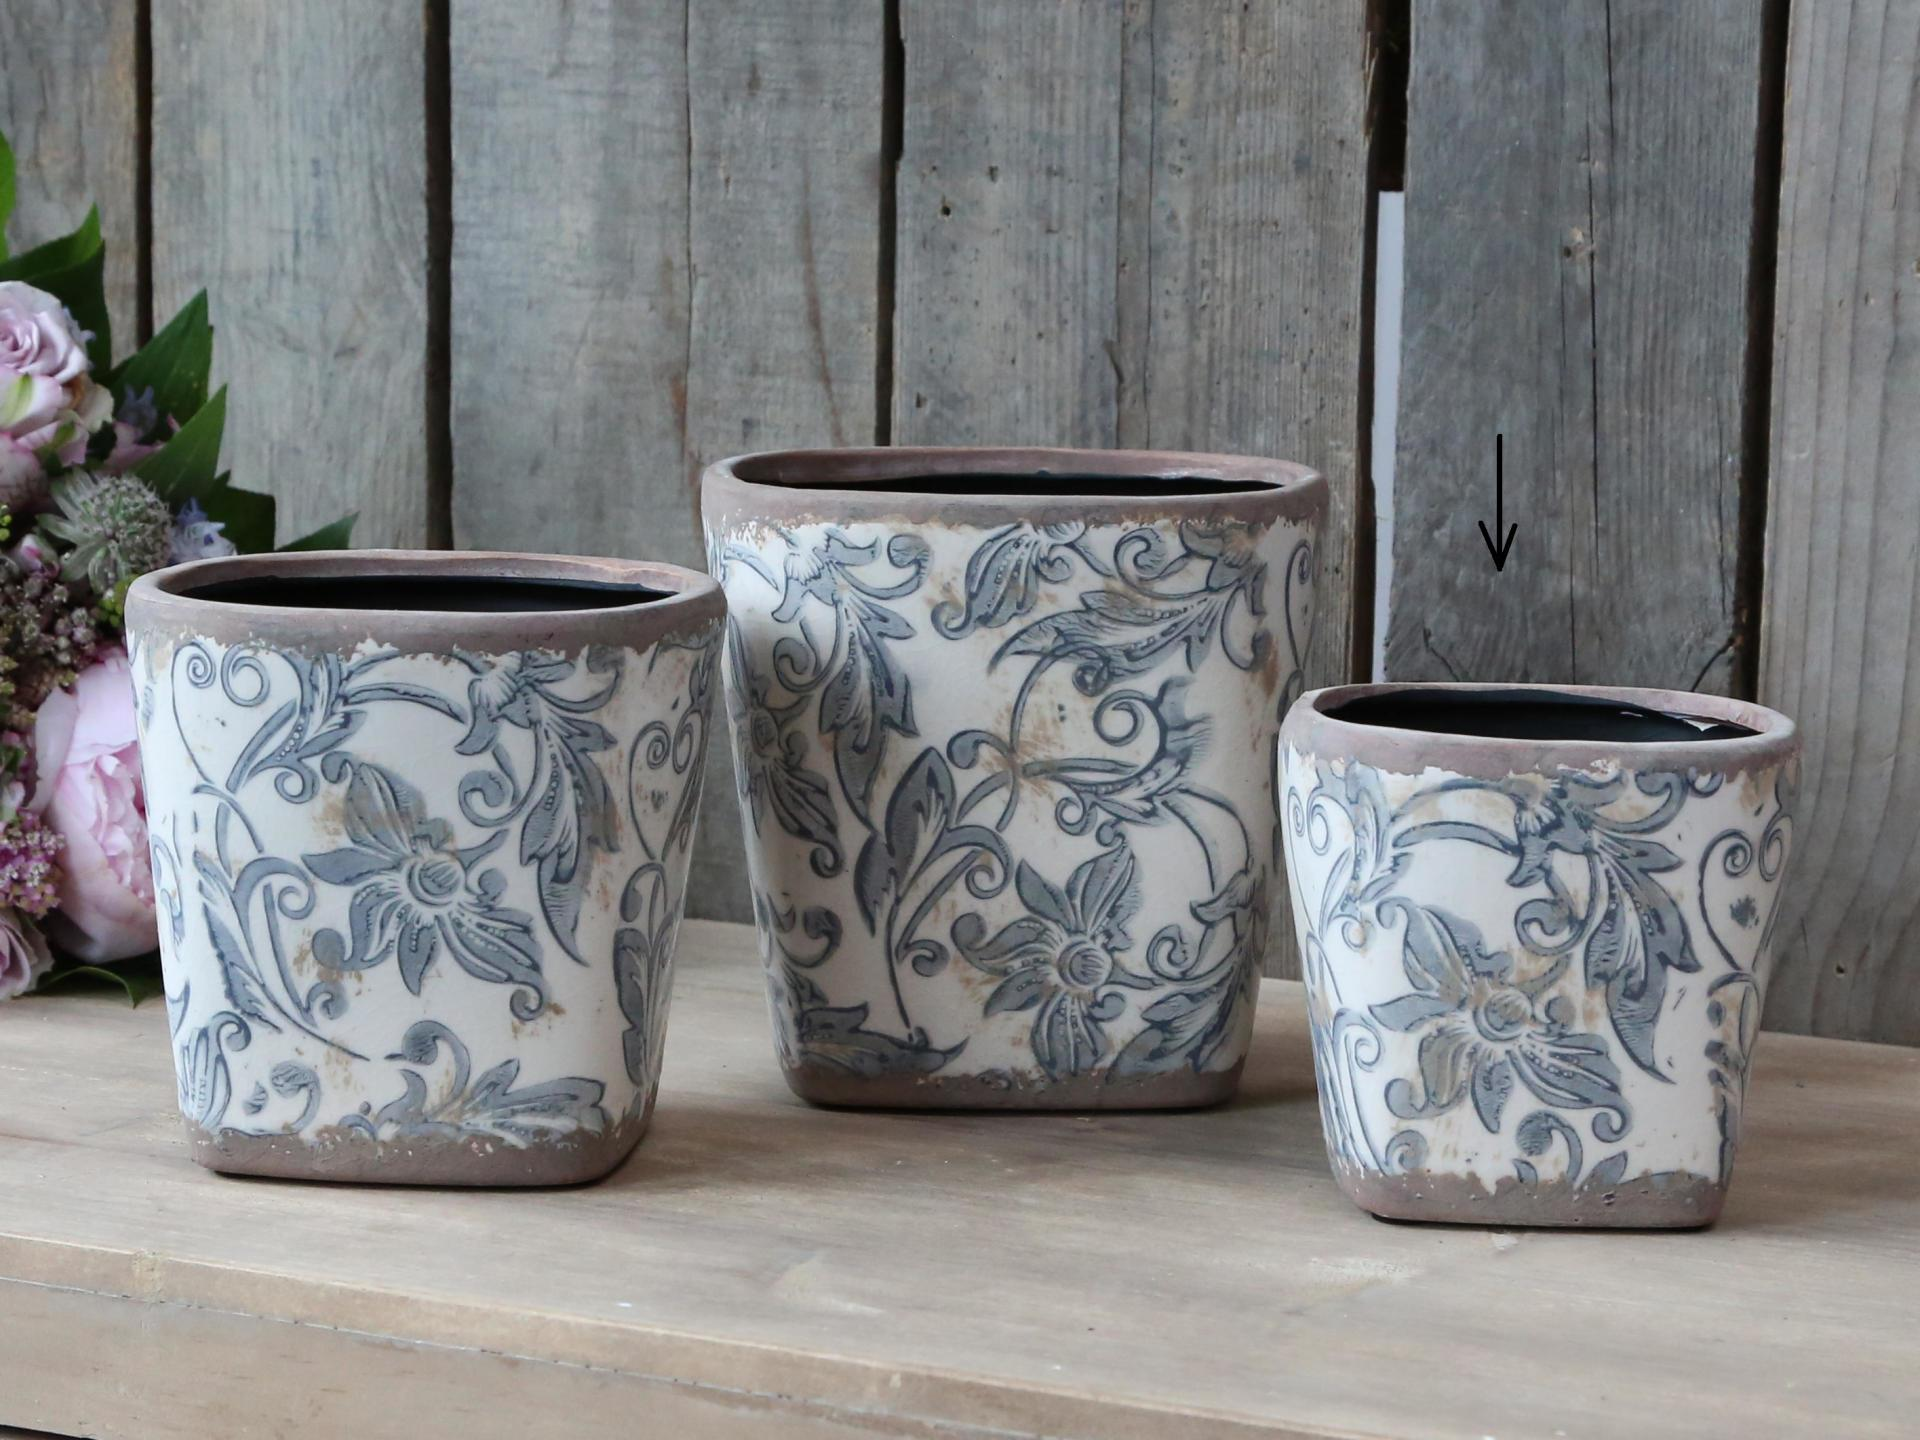 Chic Antique Obal na květiny French Pattern, modrá barva, keramika